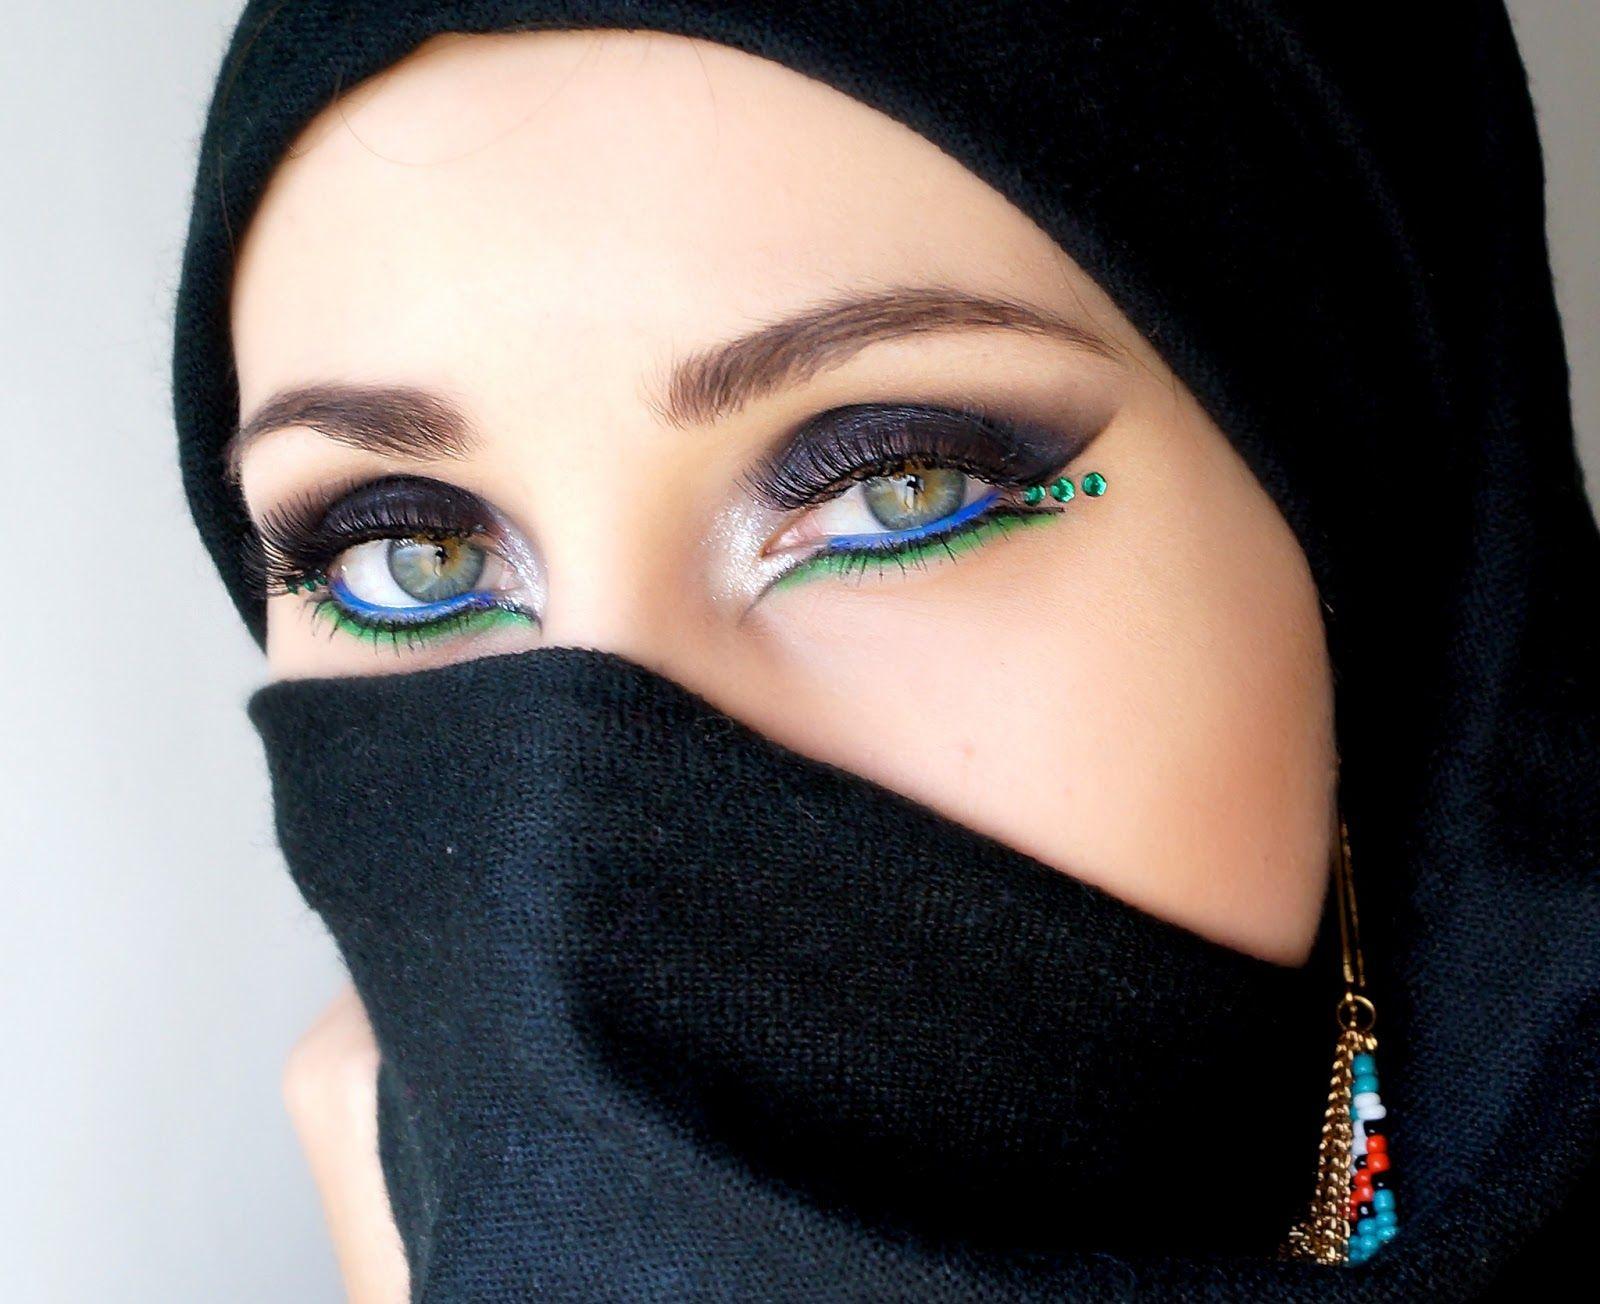 Pin By Make Up Make Up On Wizaz21  Arabic Makeup, Belly Dance Makeup, Beautiful Eye Makeup-4098